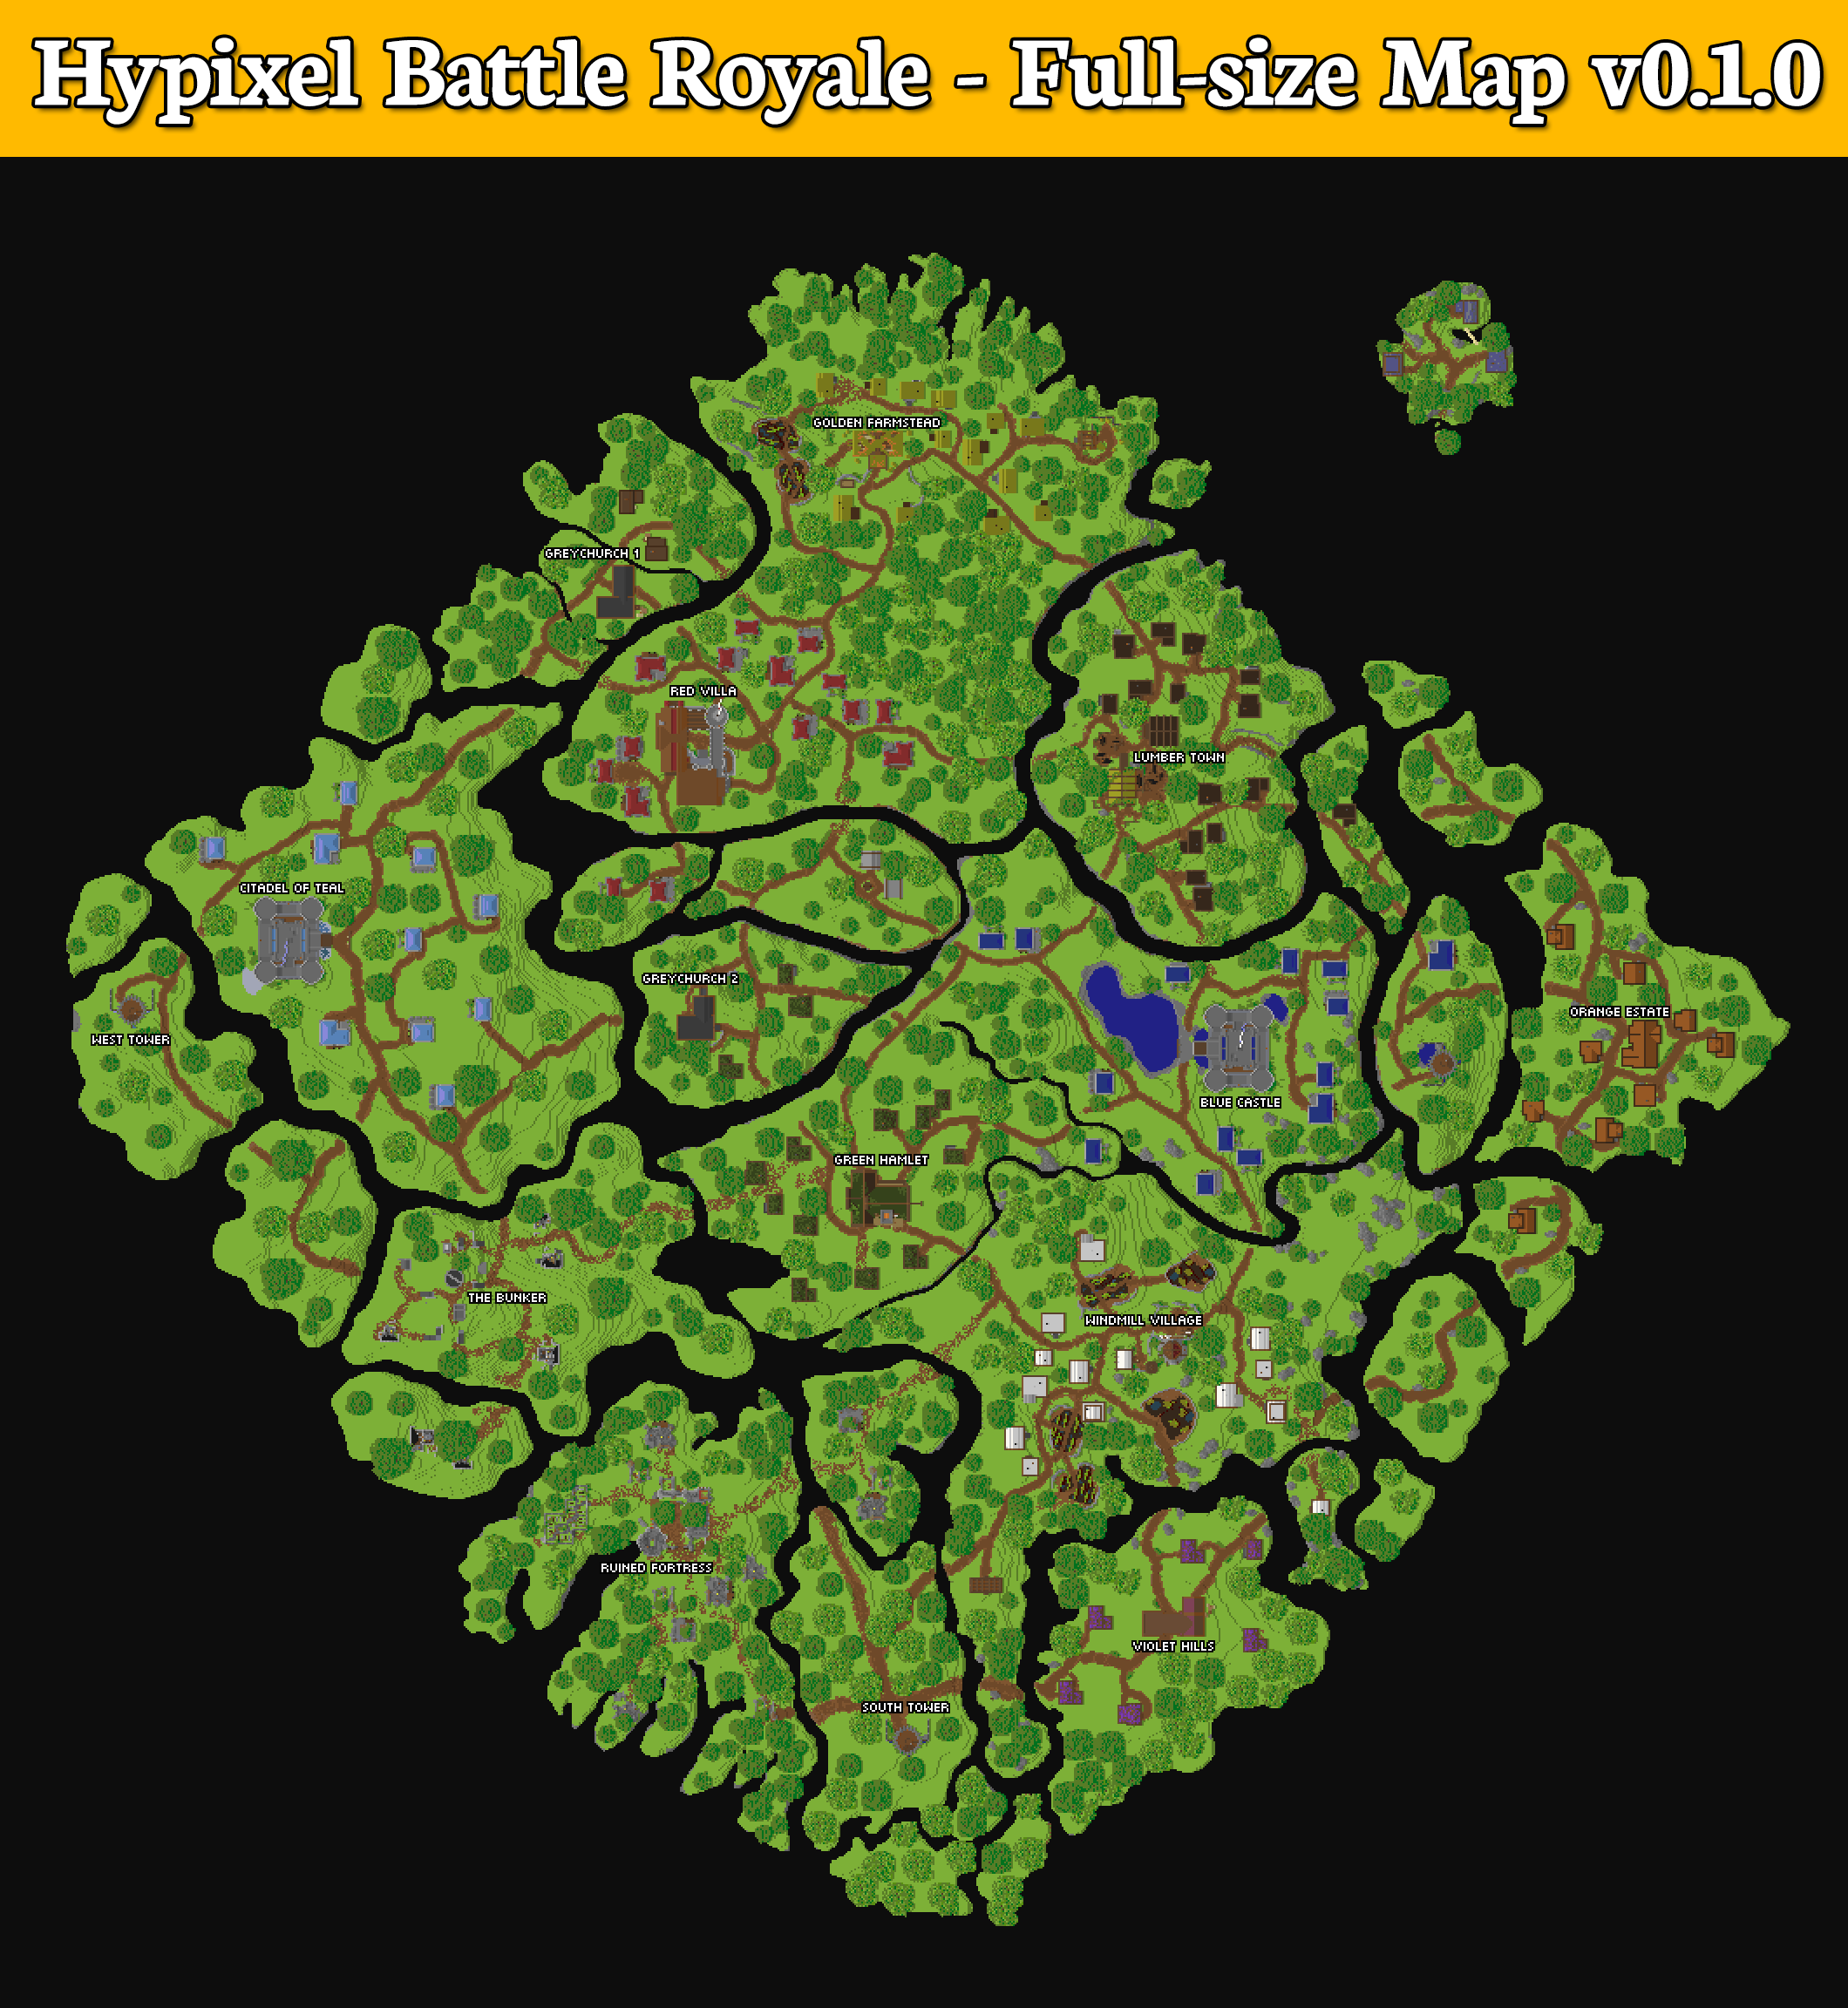 Minecraft download server hypixel | Minecraft hypixel server